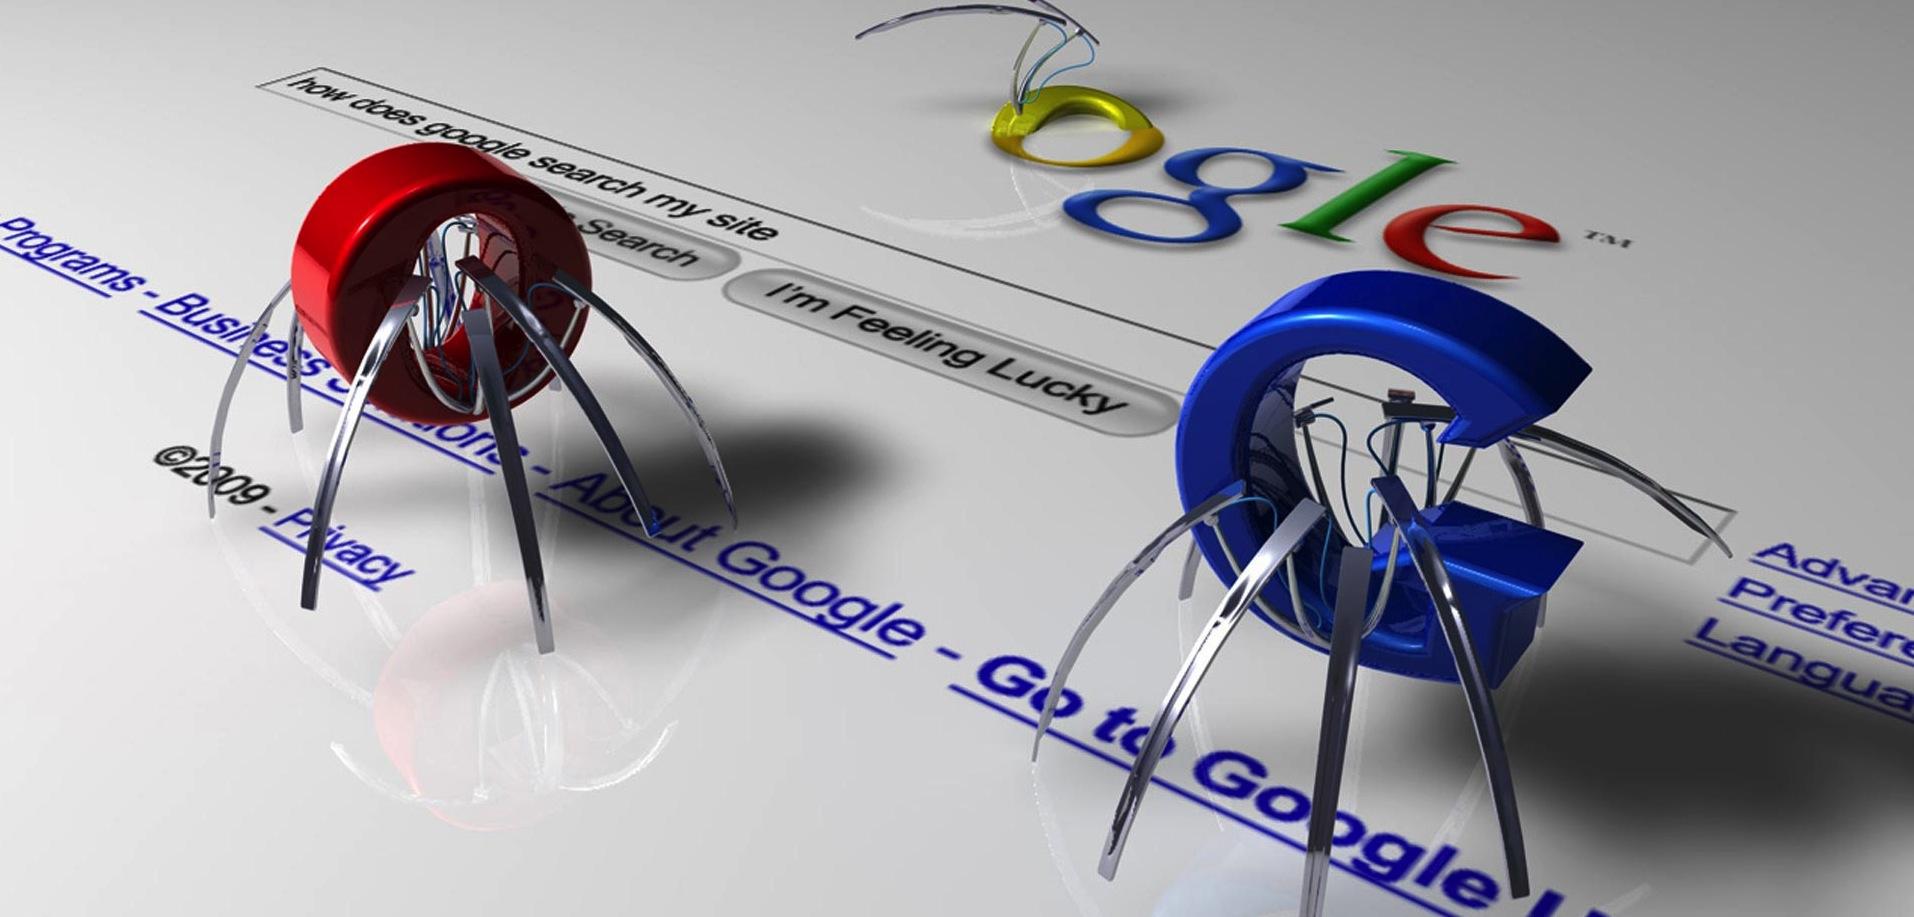 google-bots